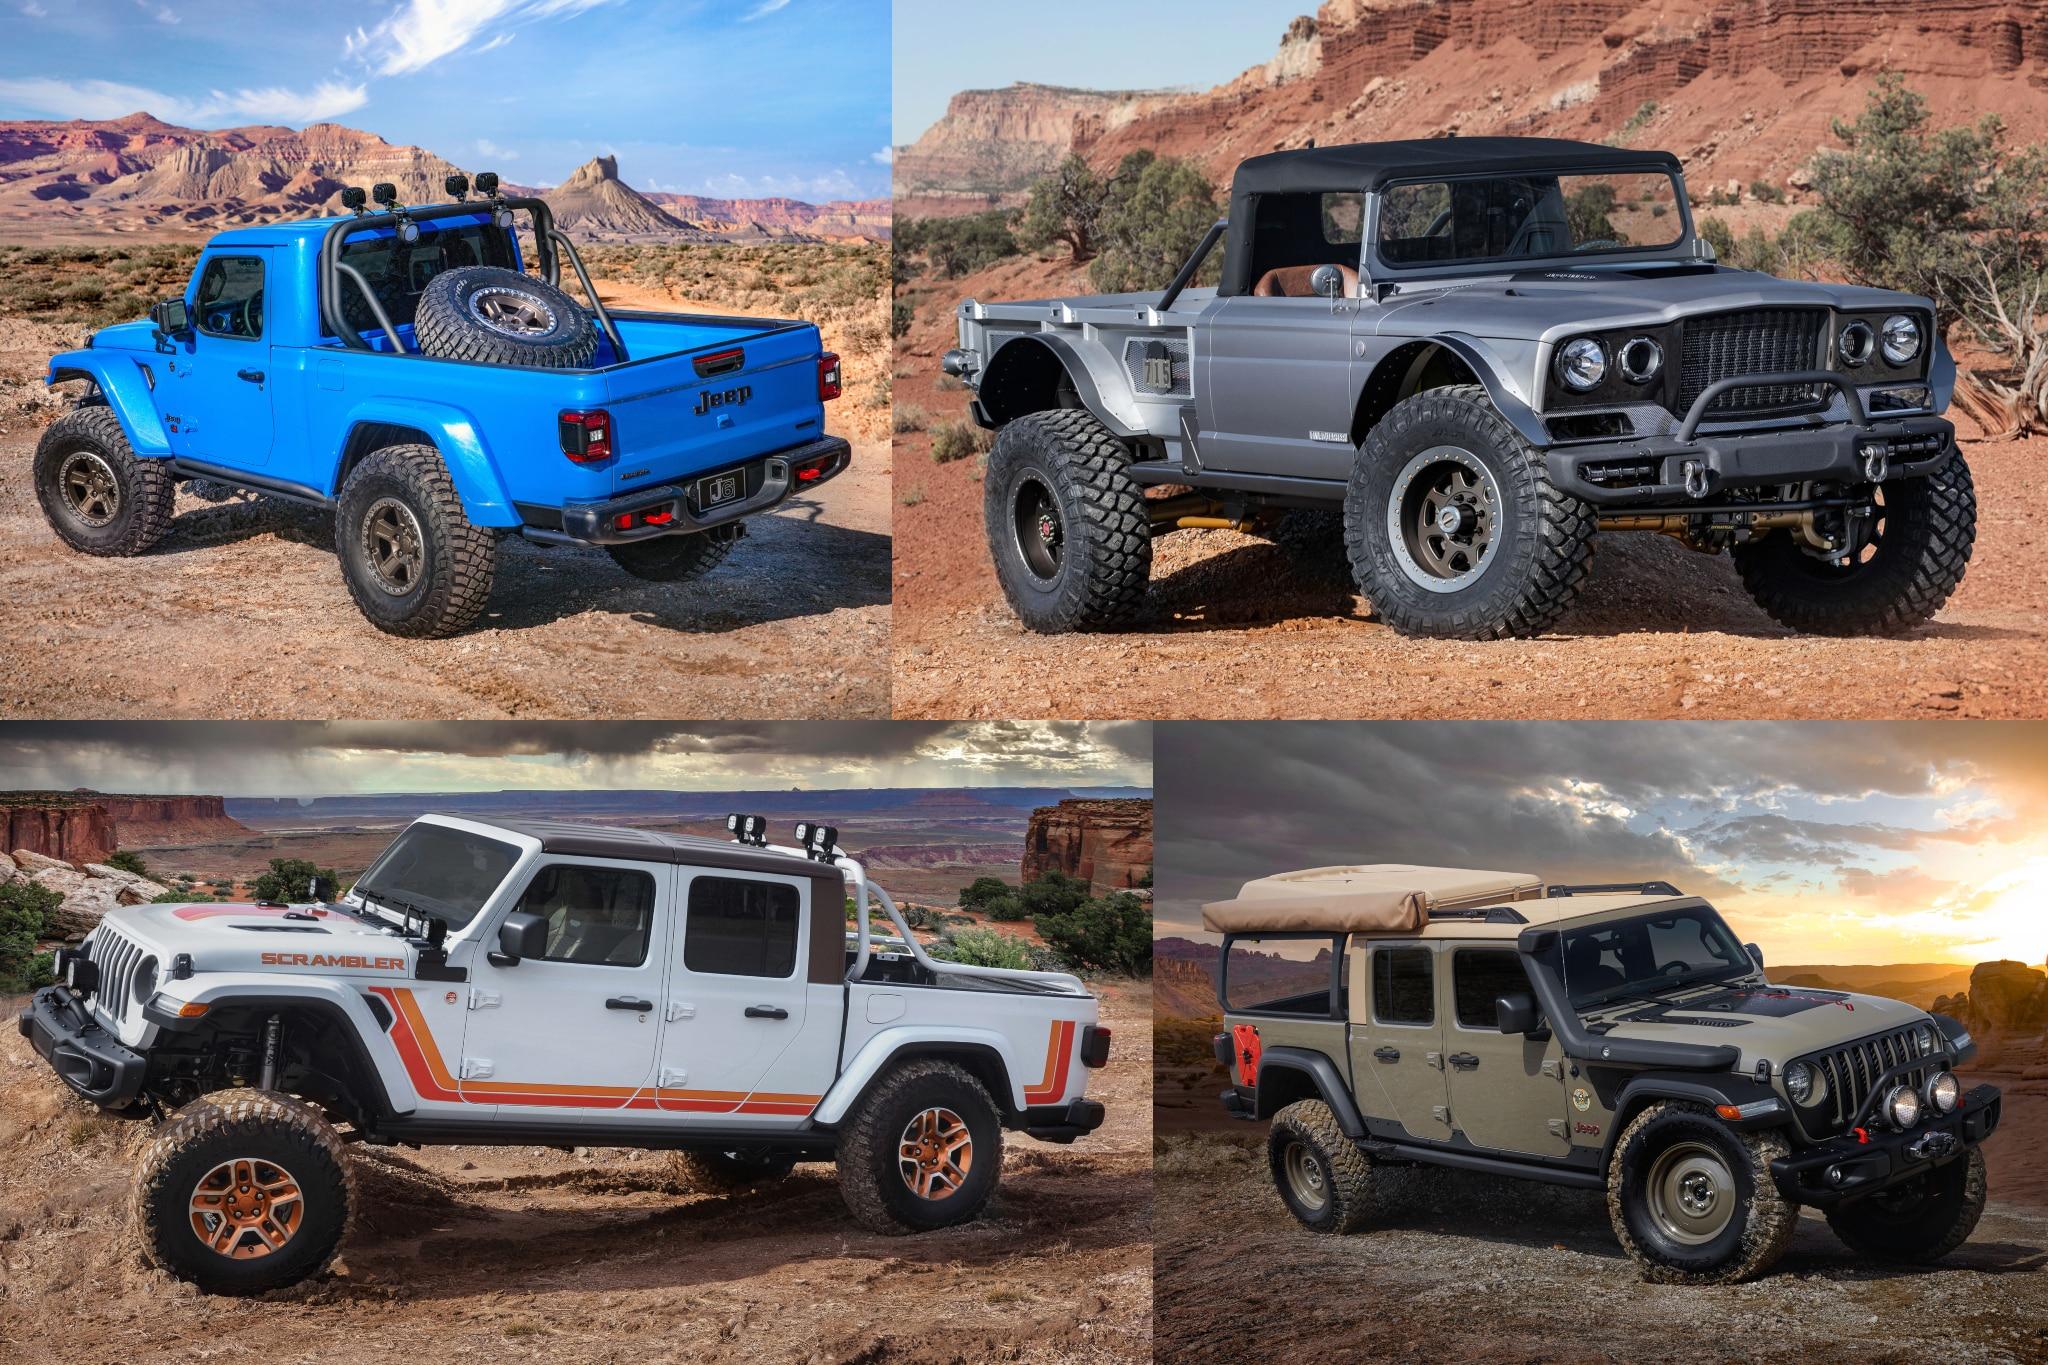 2019 Jeep Easter Safari Concepts Lead 1